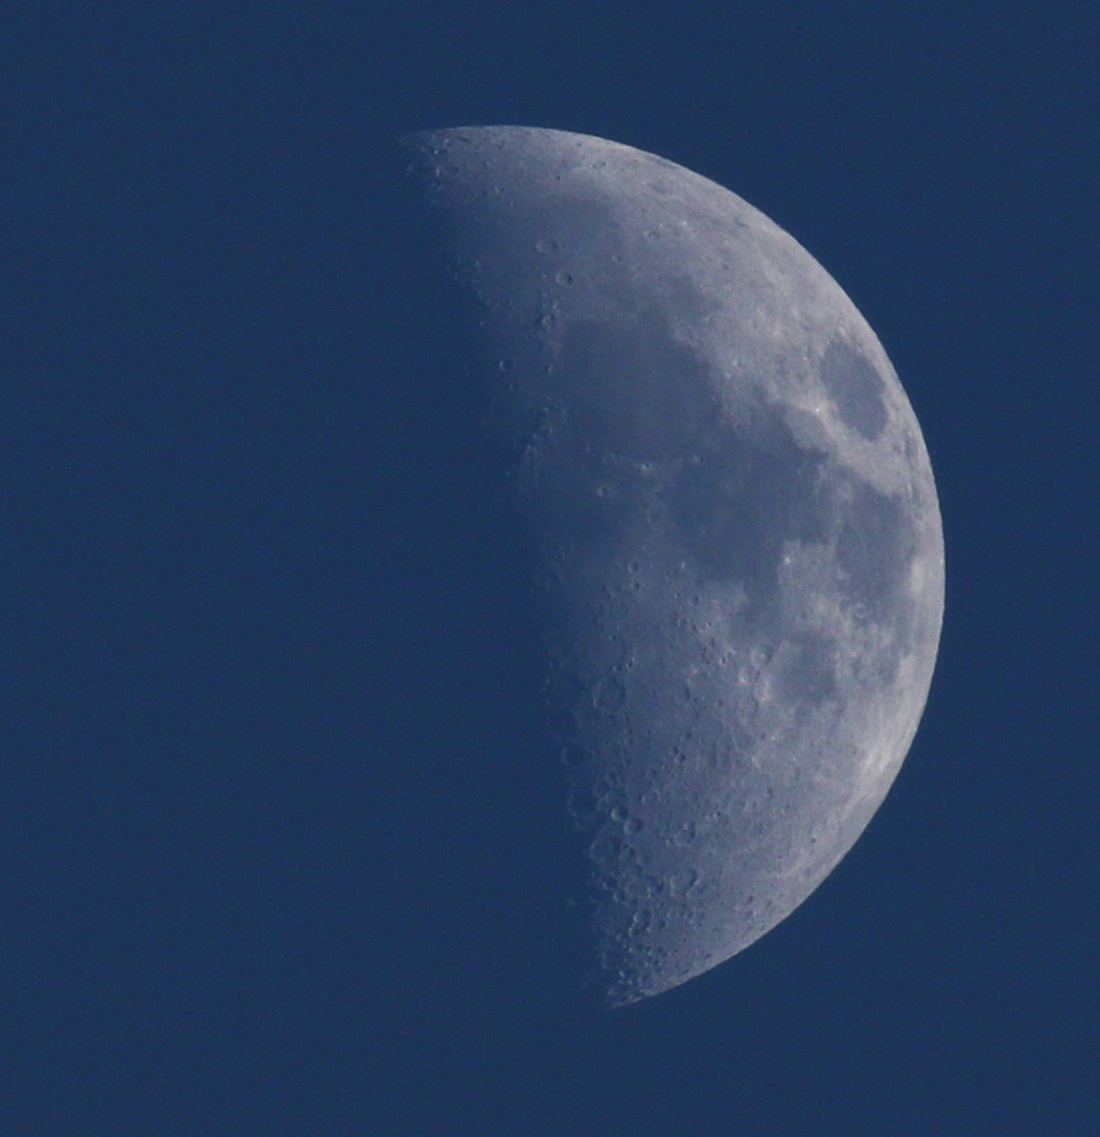 la lune, au soir du 24/01/2018 (37087/88/91/92.jpg)